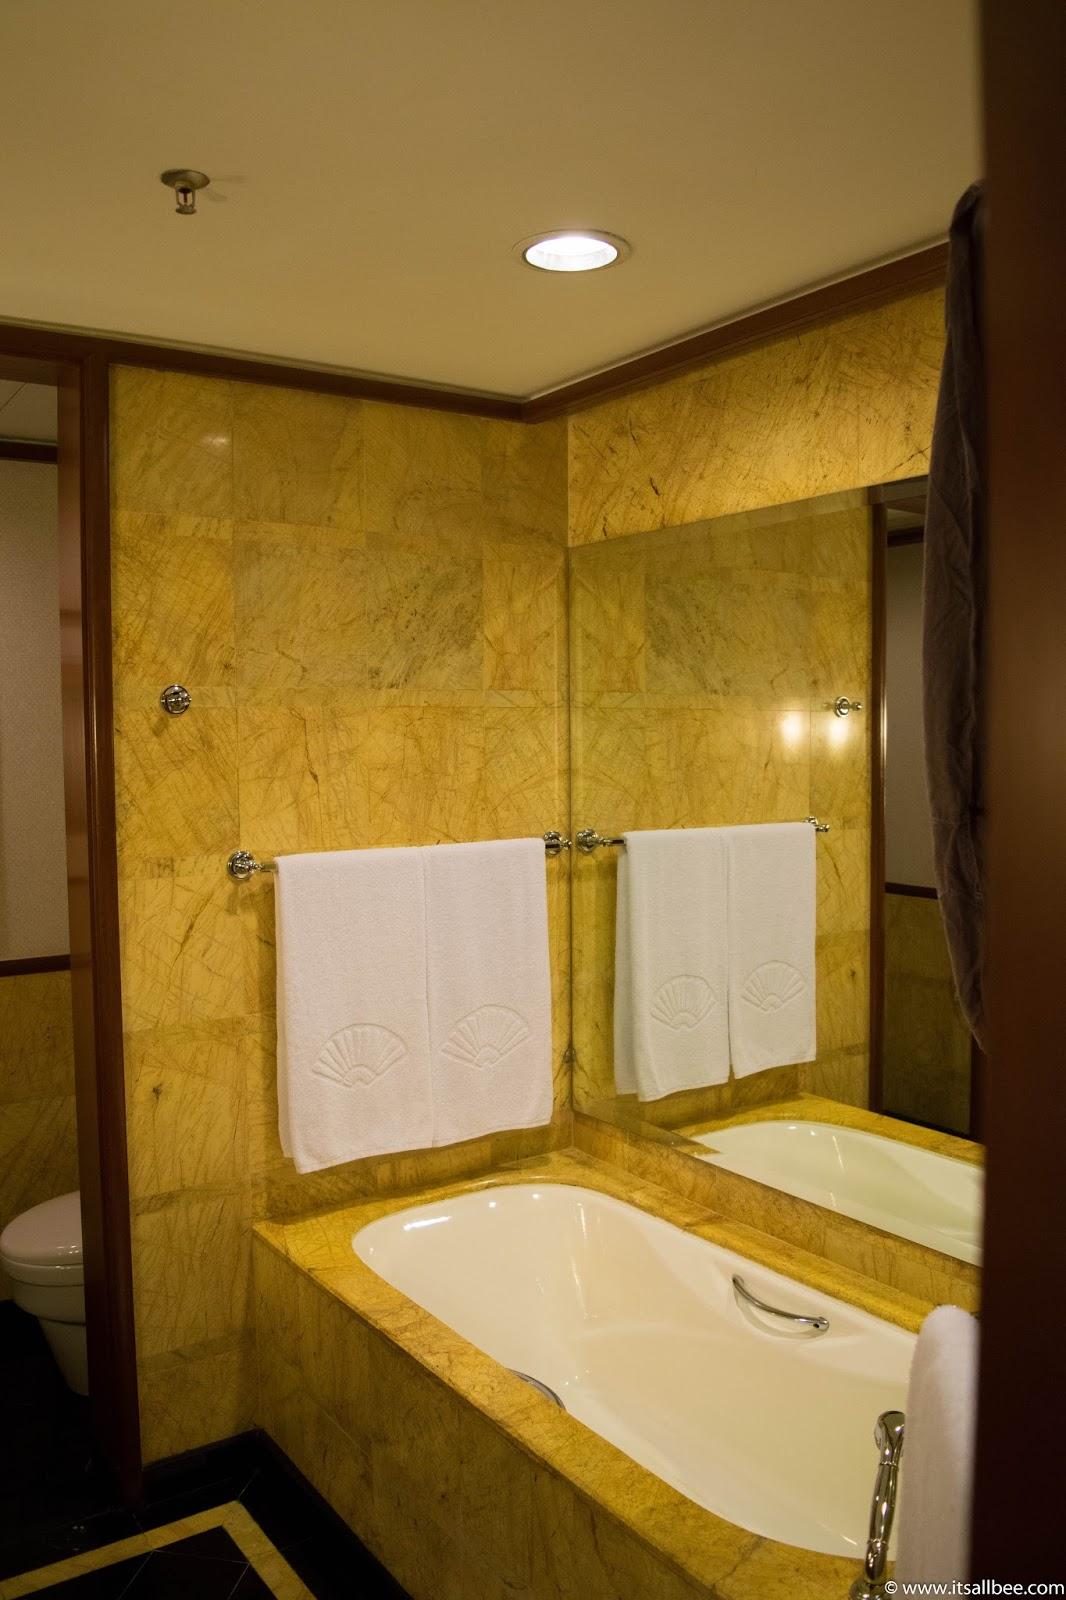 Mandarin Oriental [Hotels In Kuala Lumpur] | A slice of Luxury In Kuala Lumpur